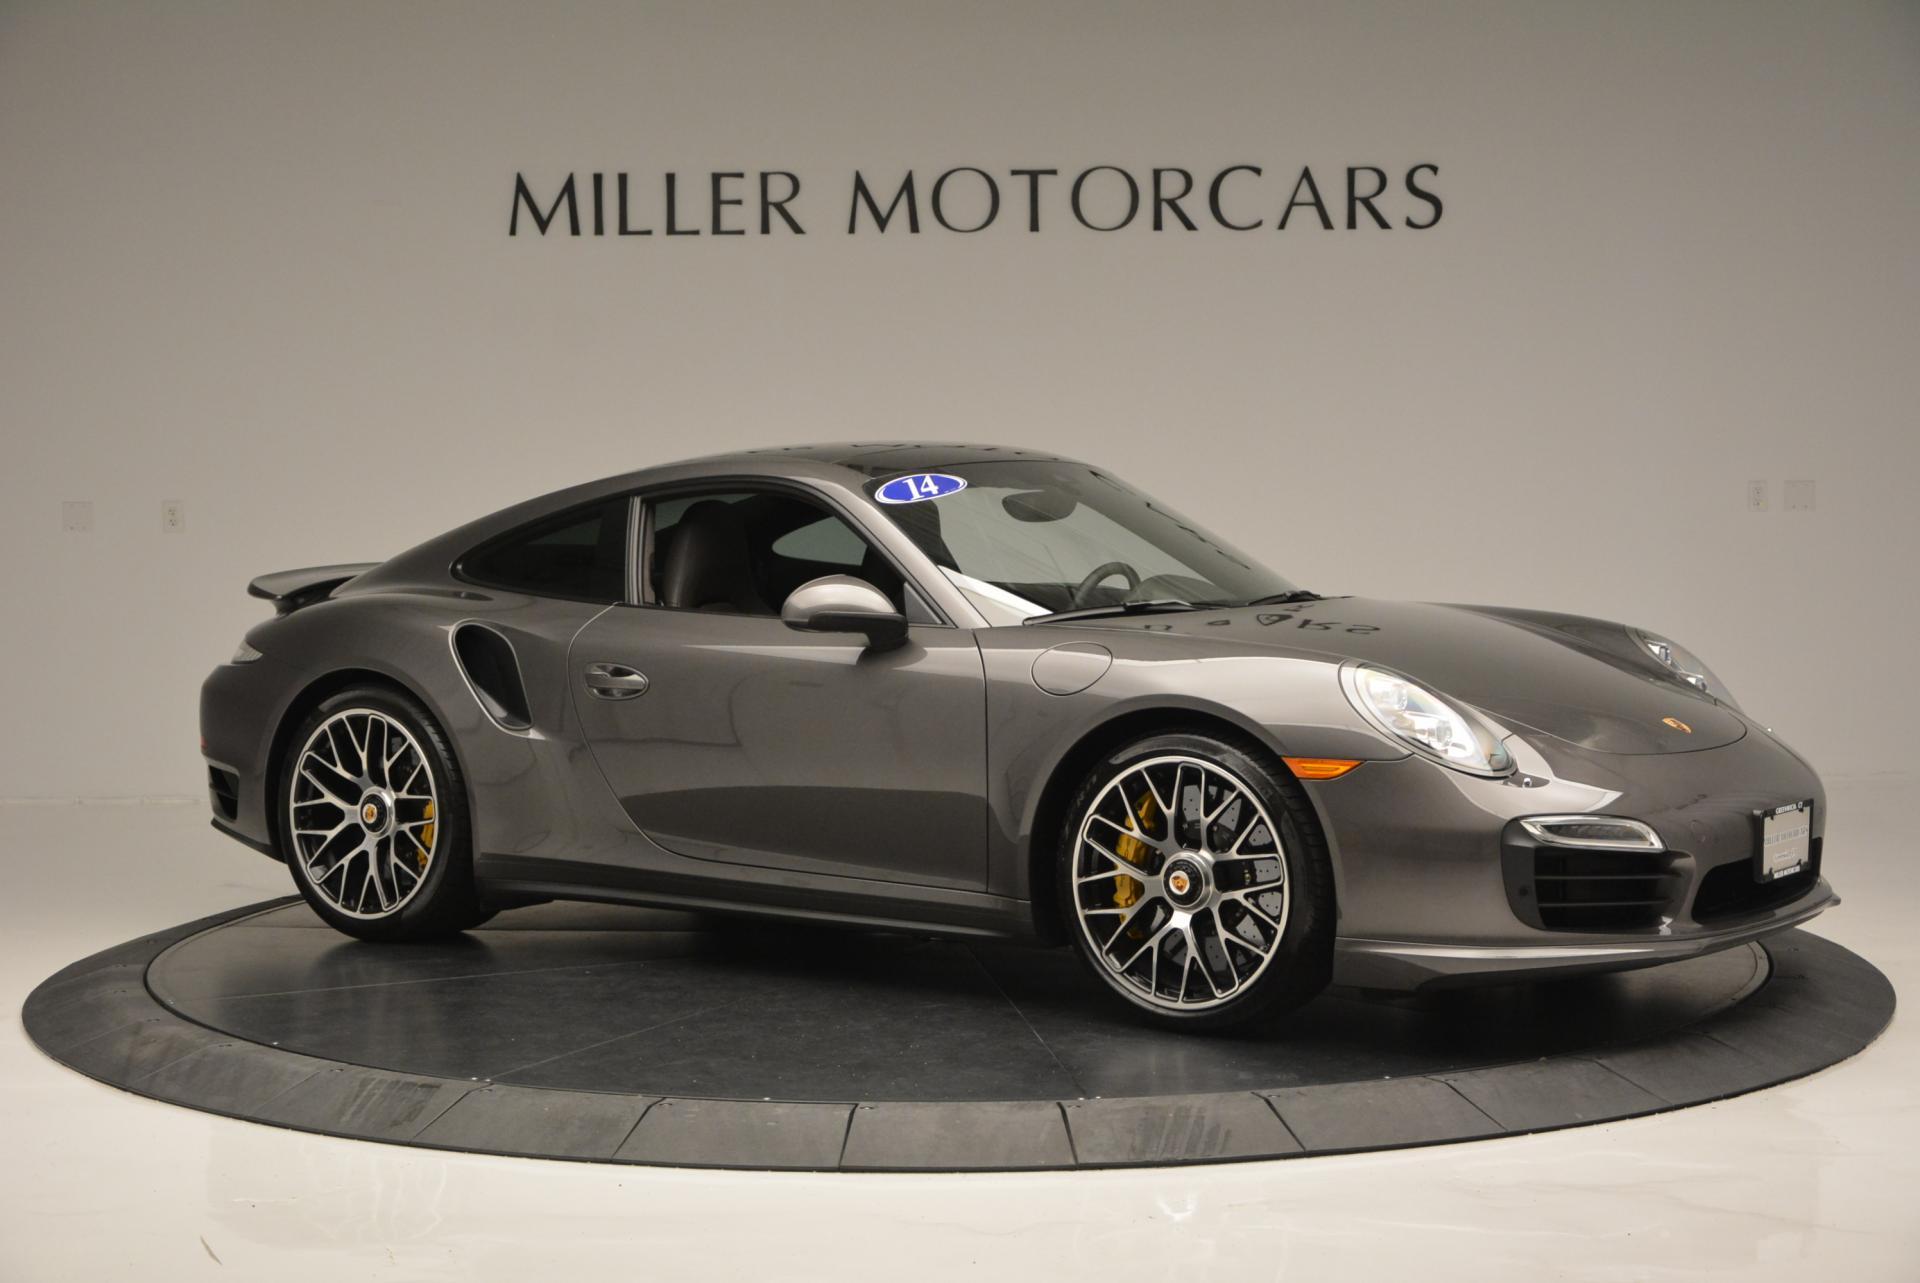 Used 2014 Porsche 911 Turbo S For Sale In Greenwich, CT 113_p9